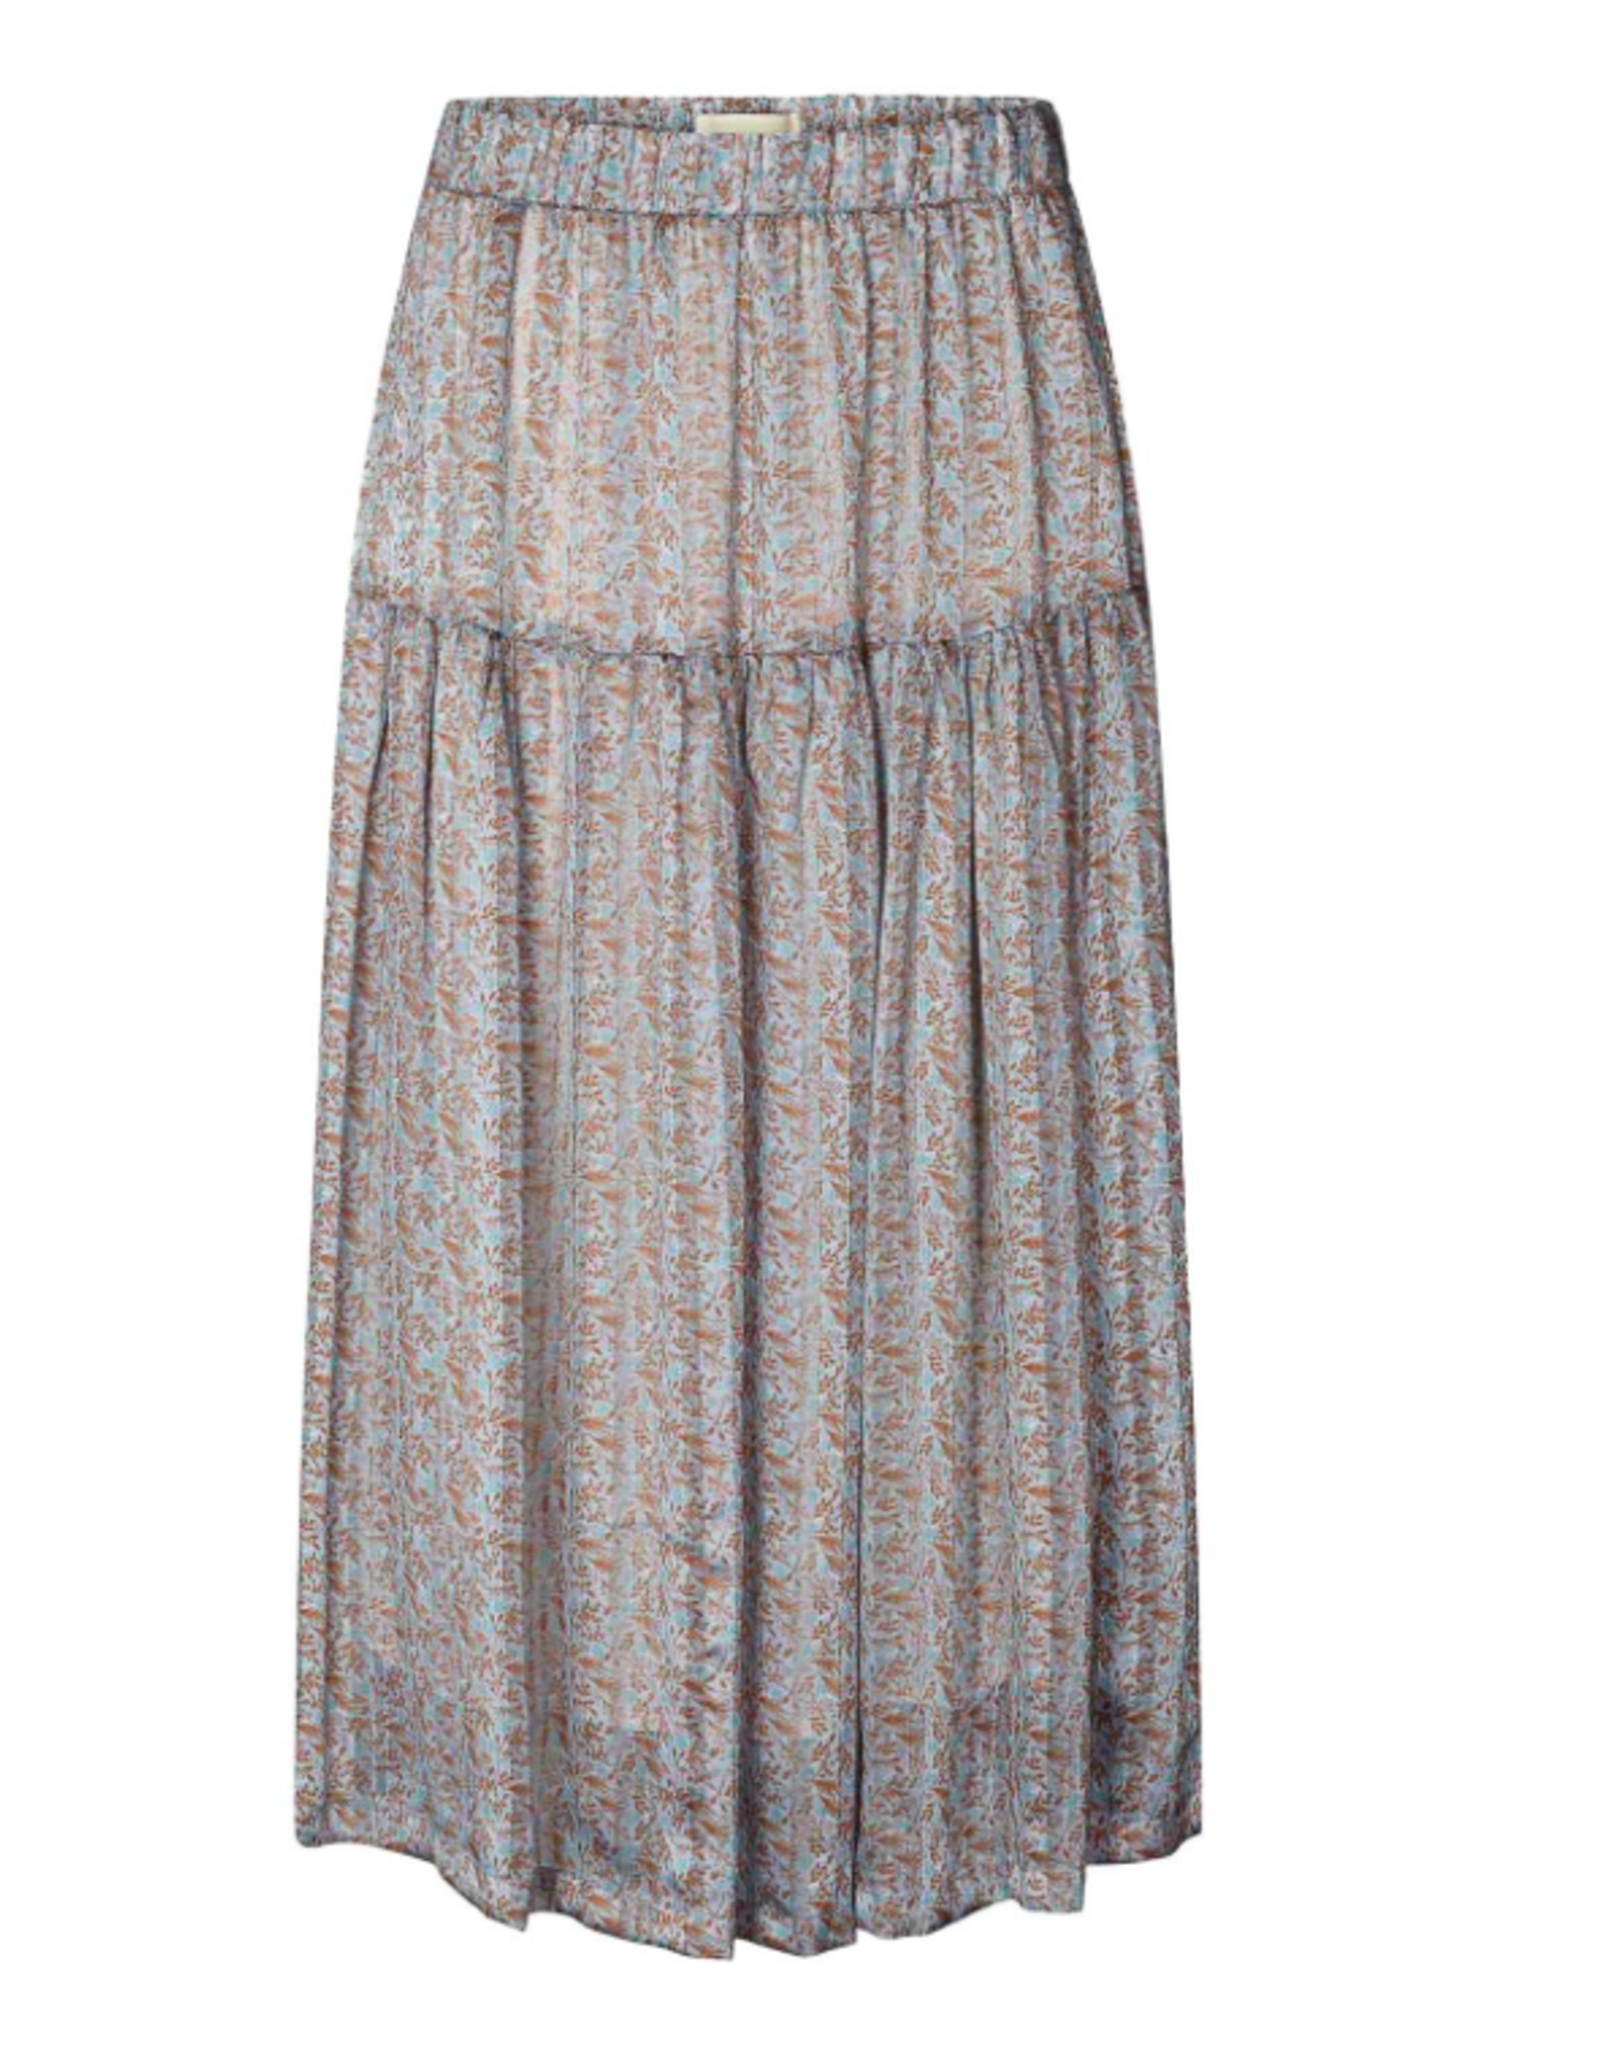 Lolly's Laundry Lollys Laundry - Cokko skirt dusty blue